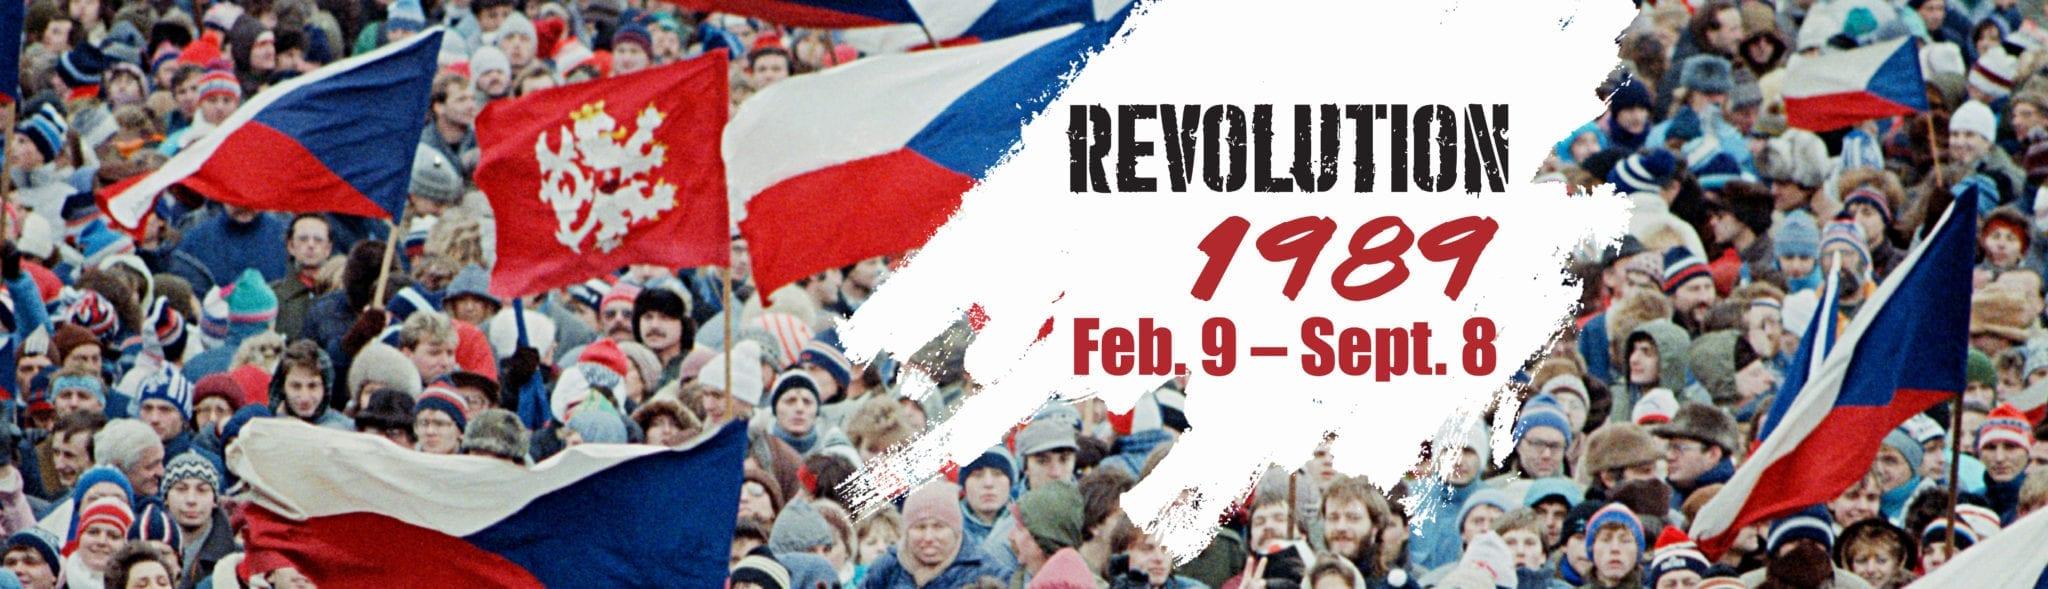 Revolution-1989-Web-Banner-01